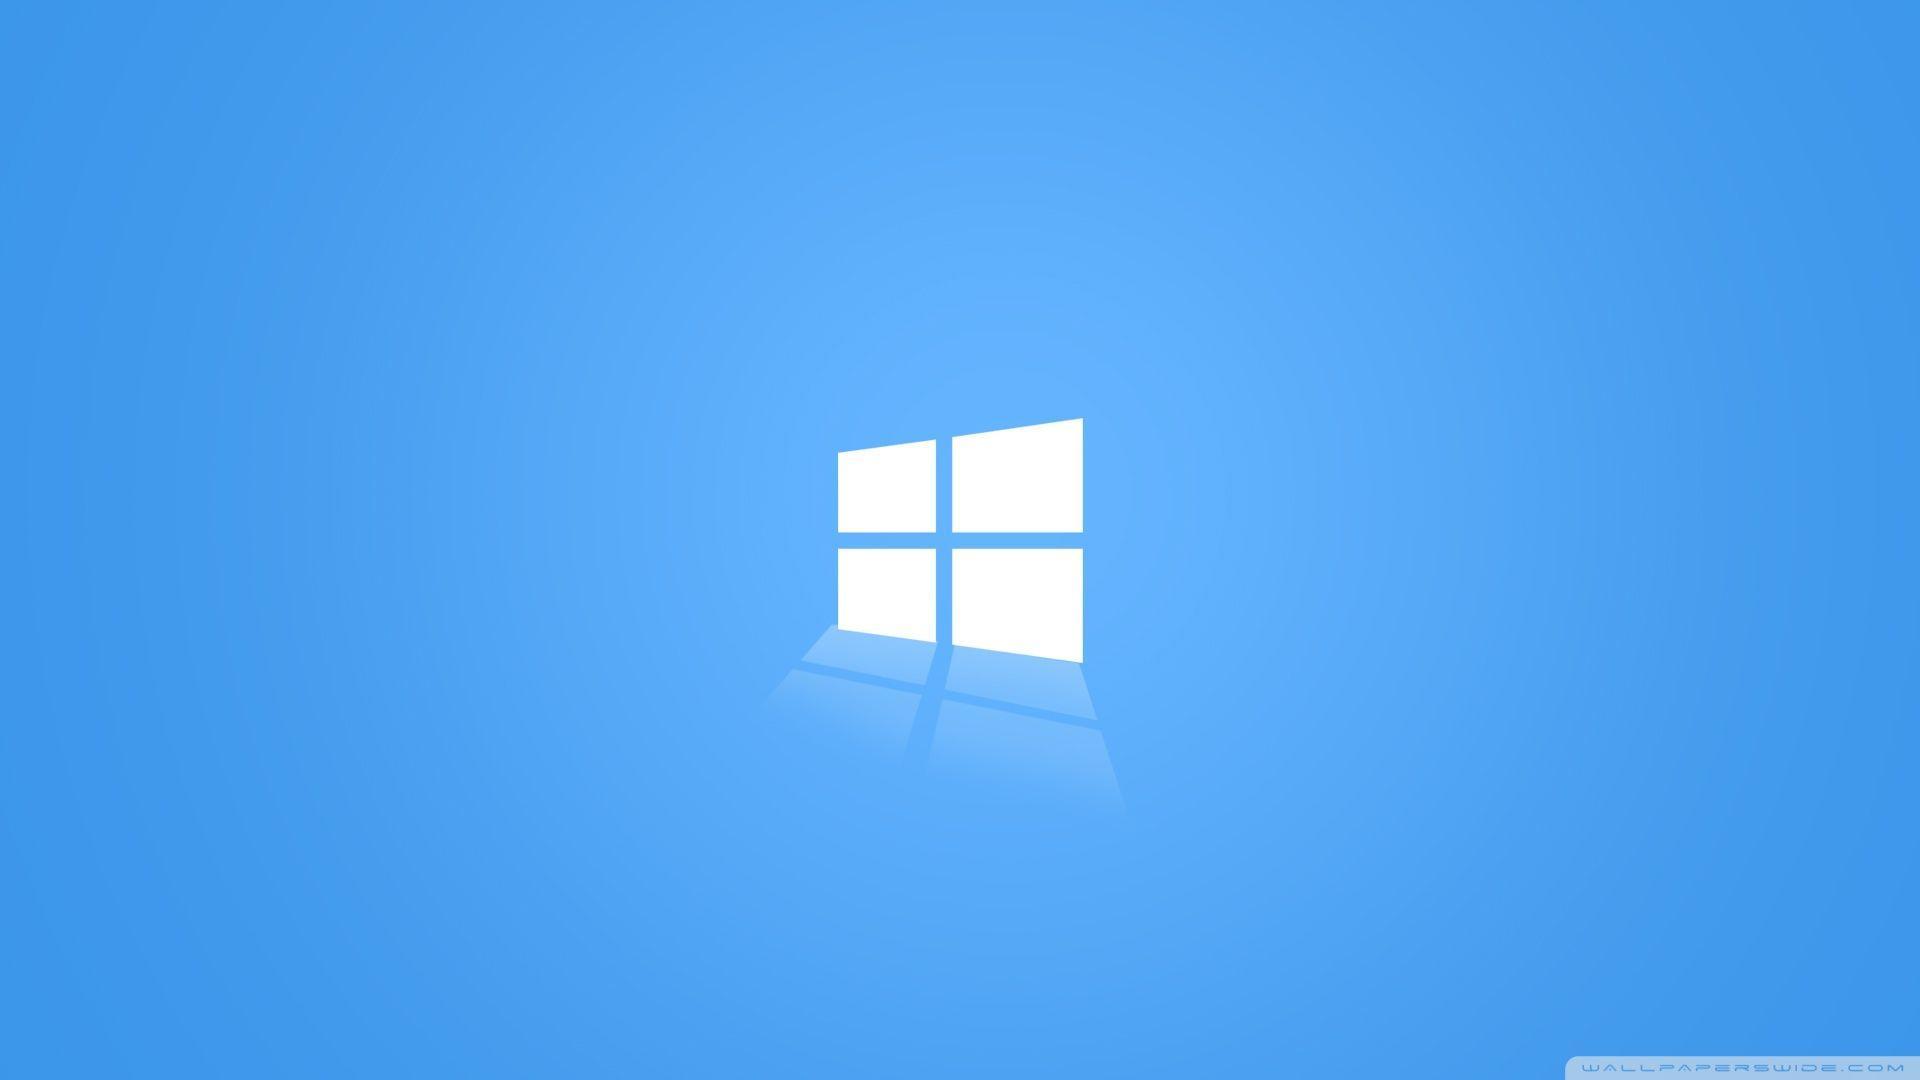 Windows Hd Wallpapers 1920x1080 Wallpaper Cave